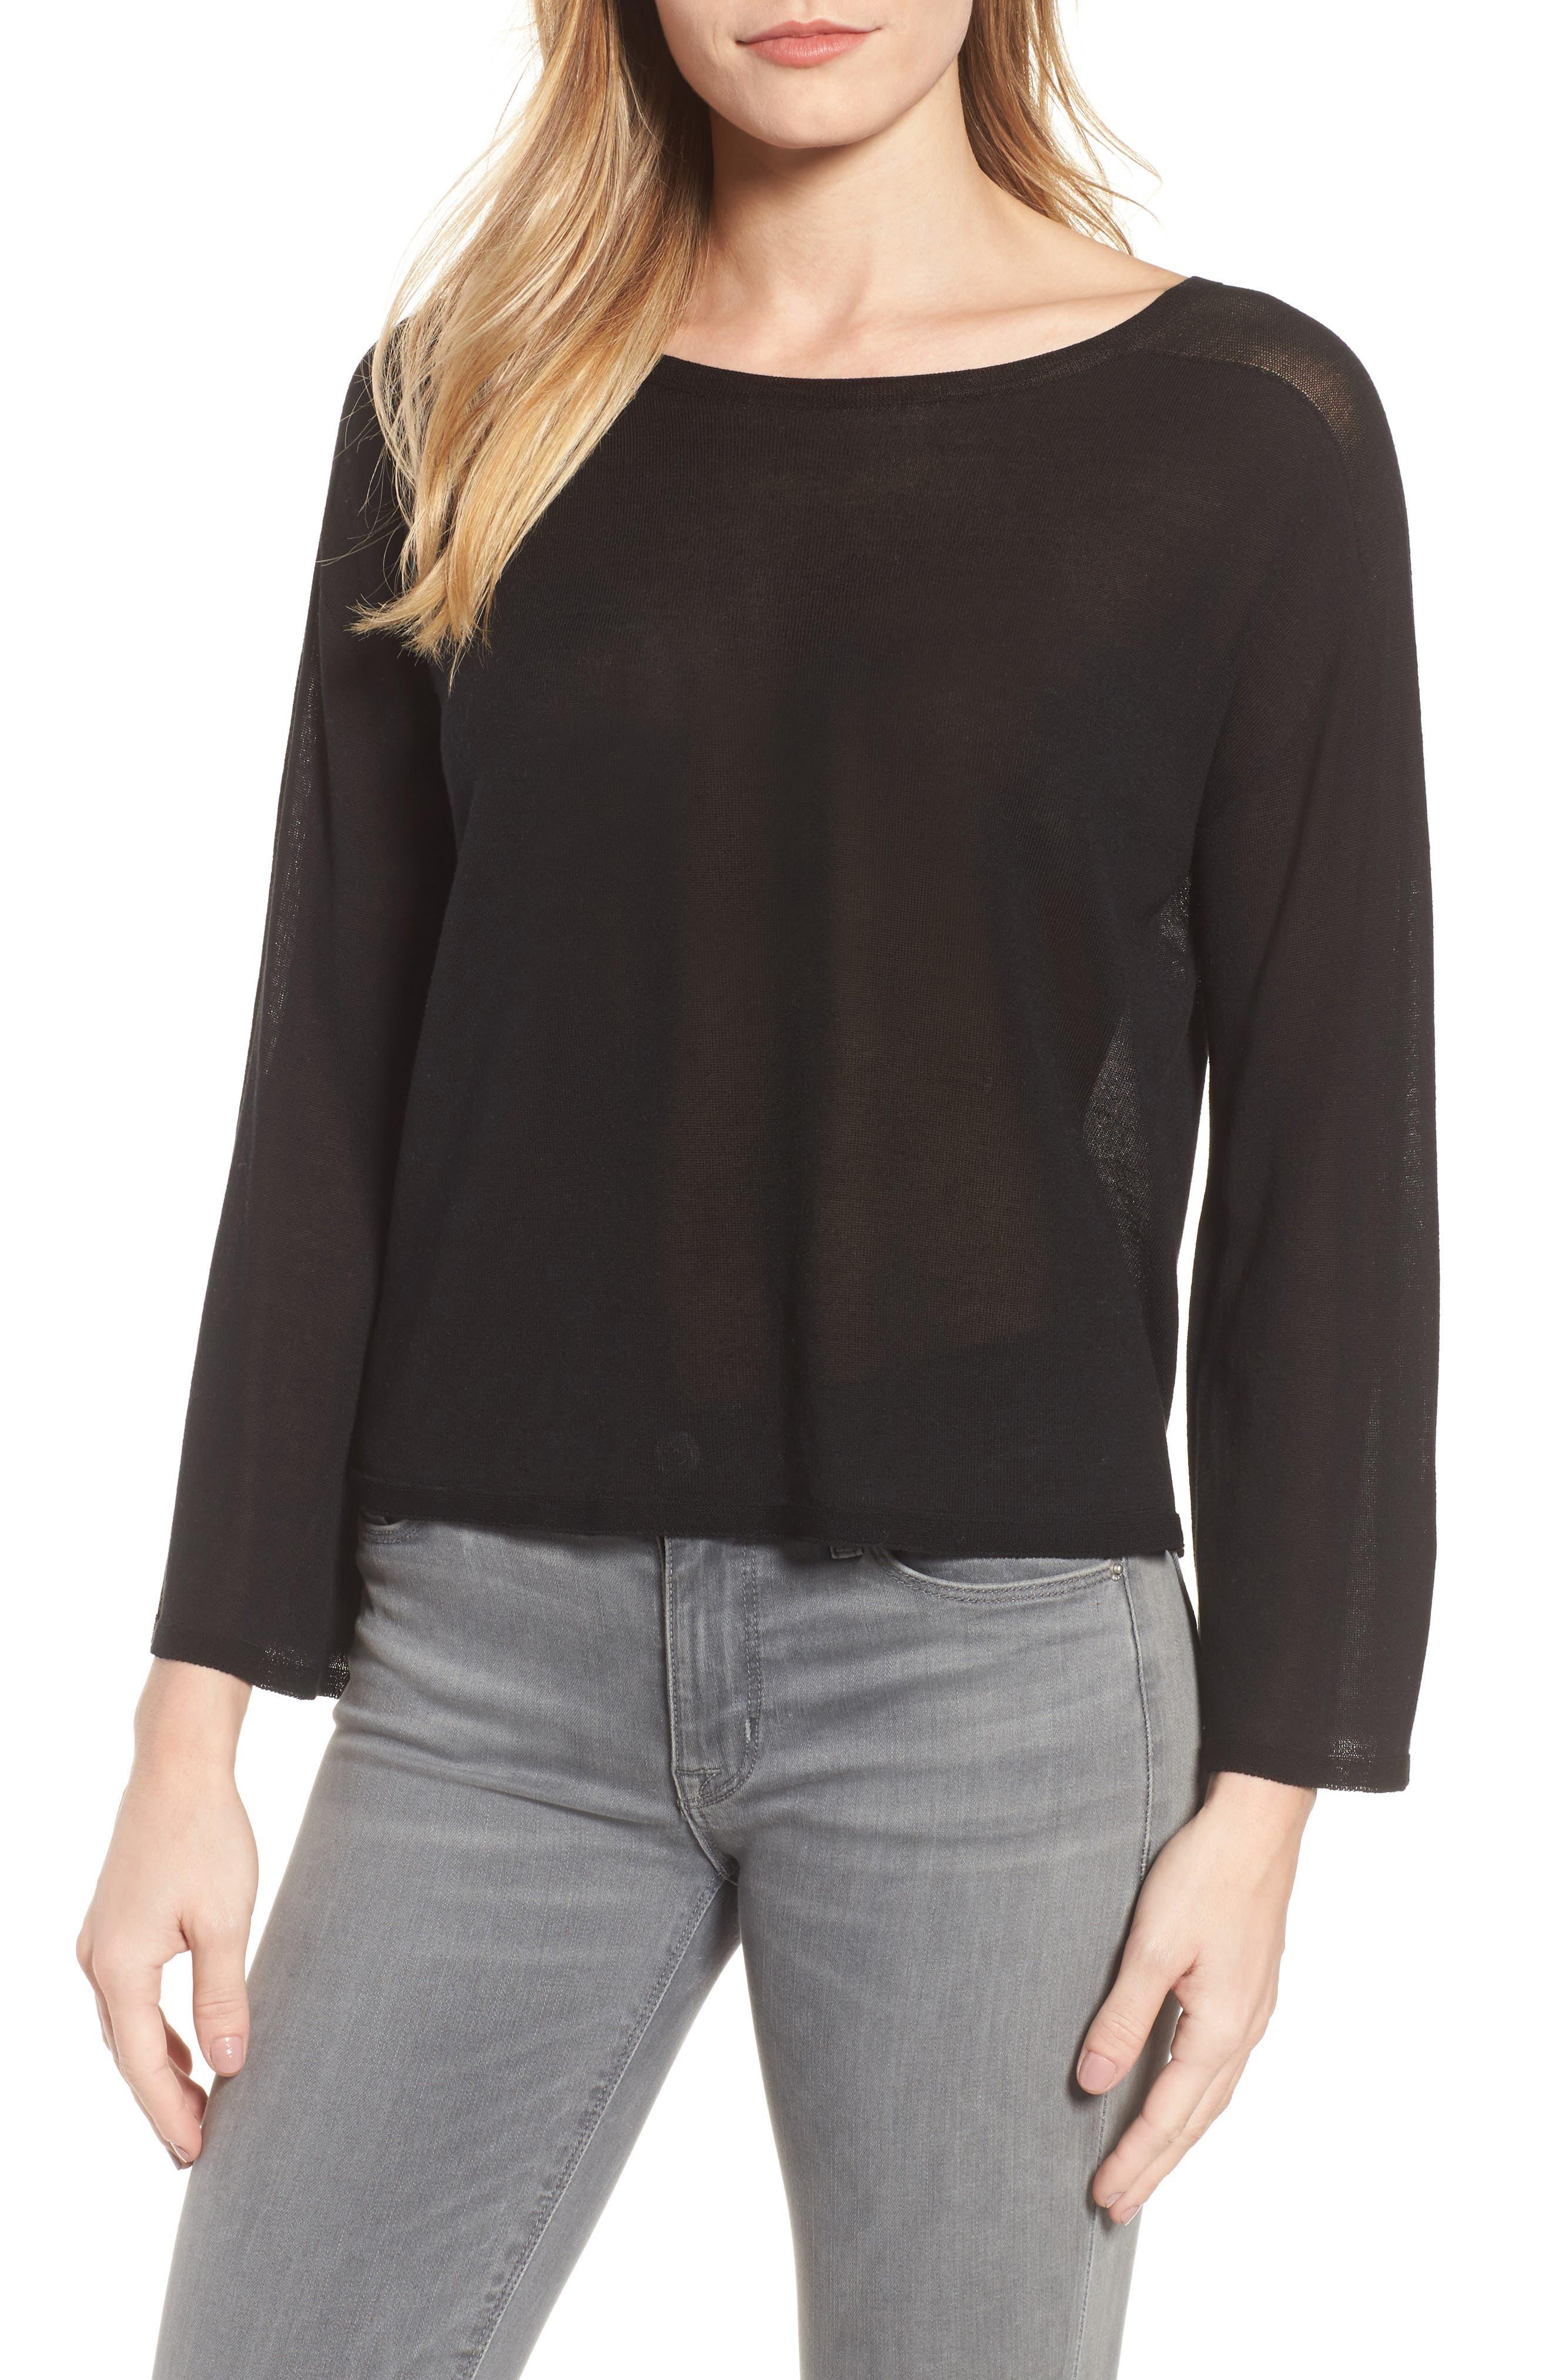 Tencel<sup>®</sup> Lyocell Knit Sweater,                             Main thumbnail 1, color,                             001